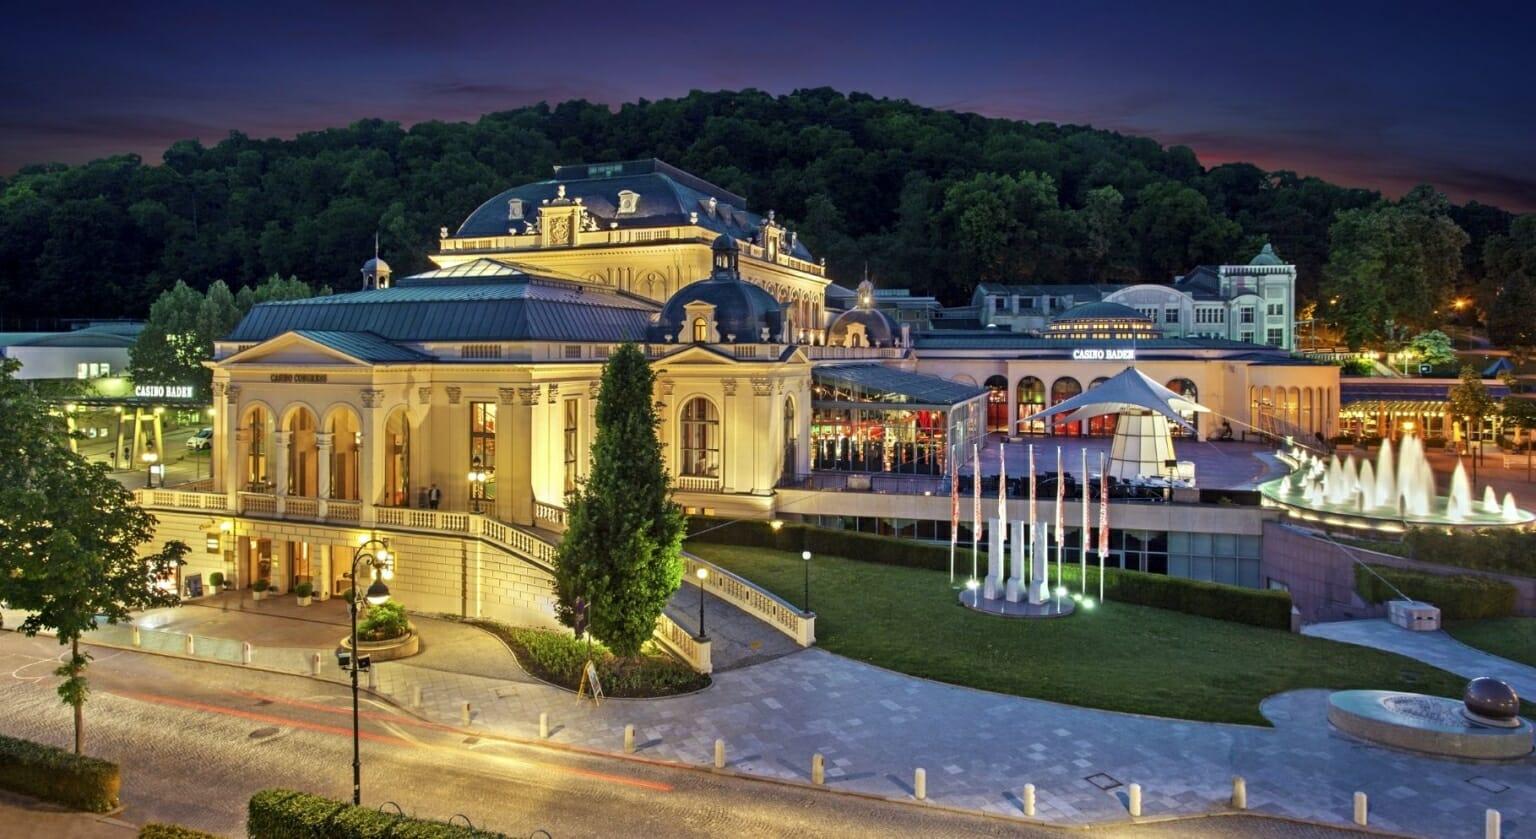 Casino Baden Baden Deutschland